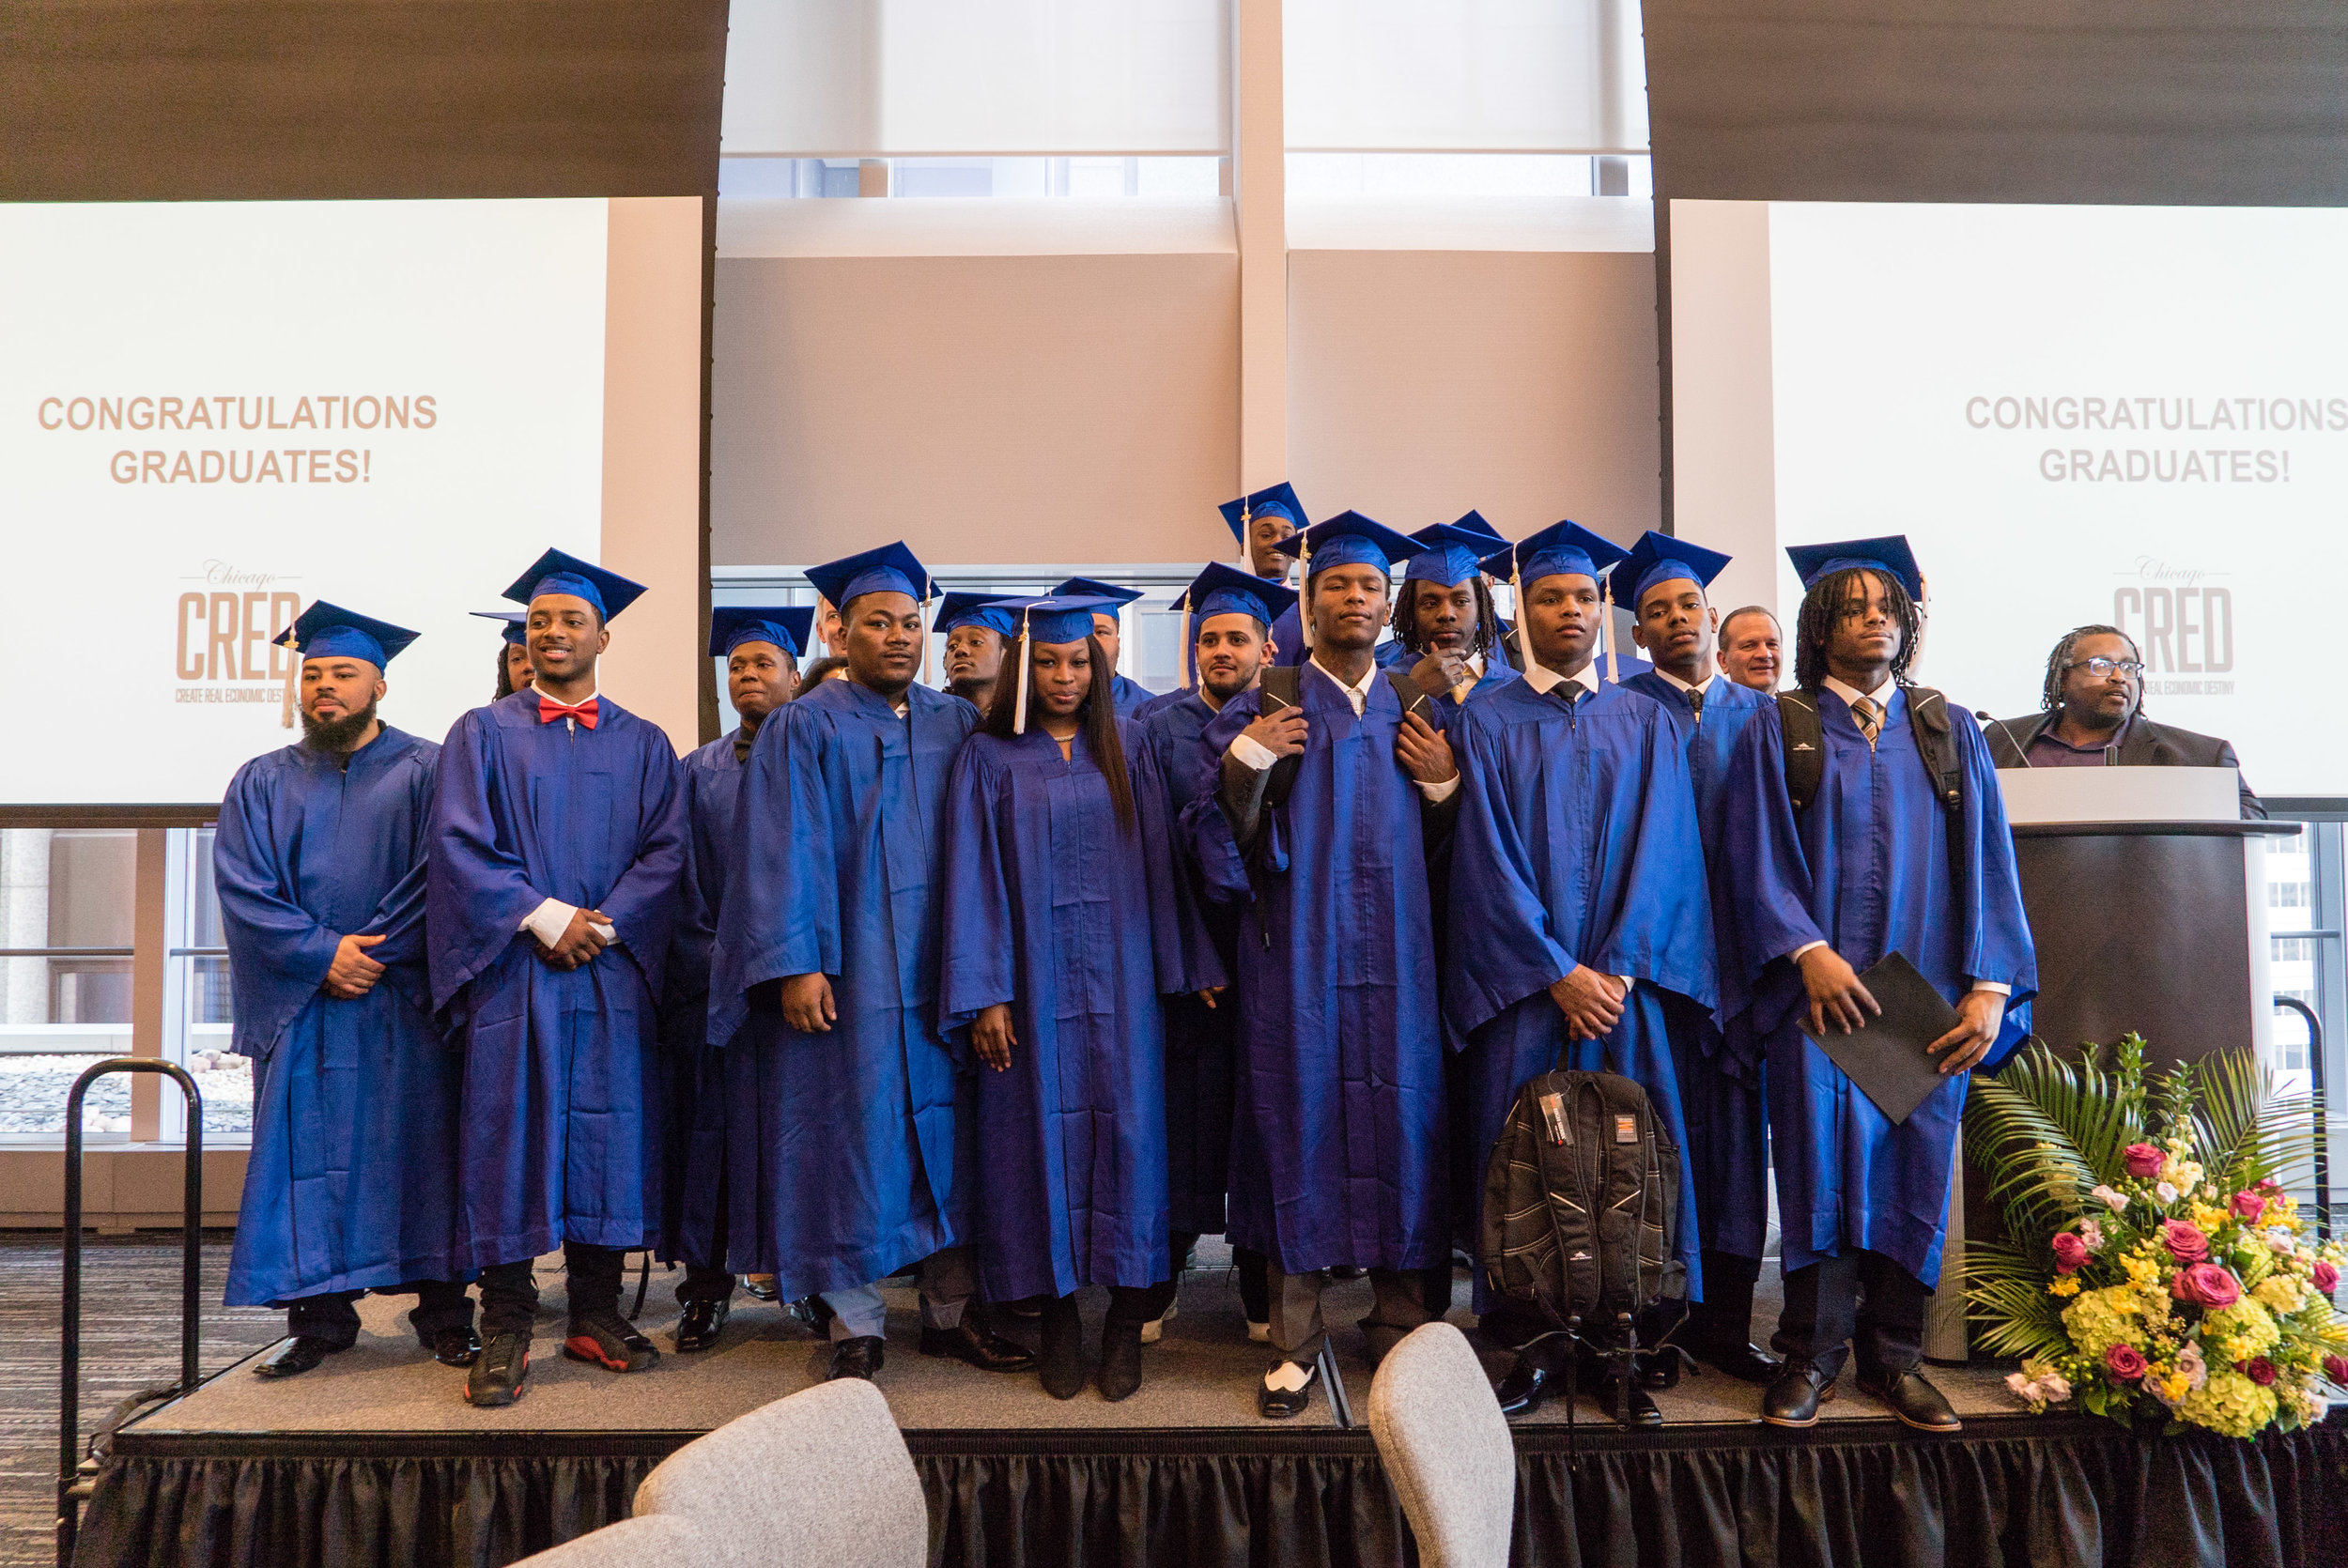 CRED_Graduation_Chicago_04062018-14.jpg